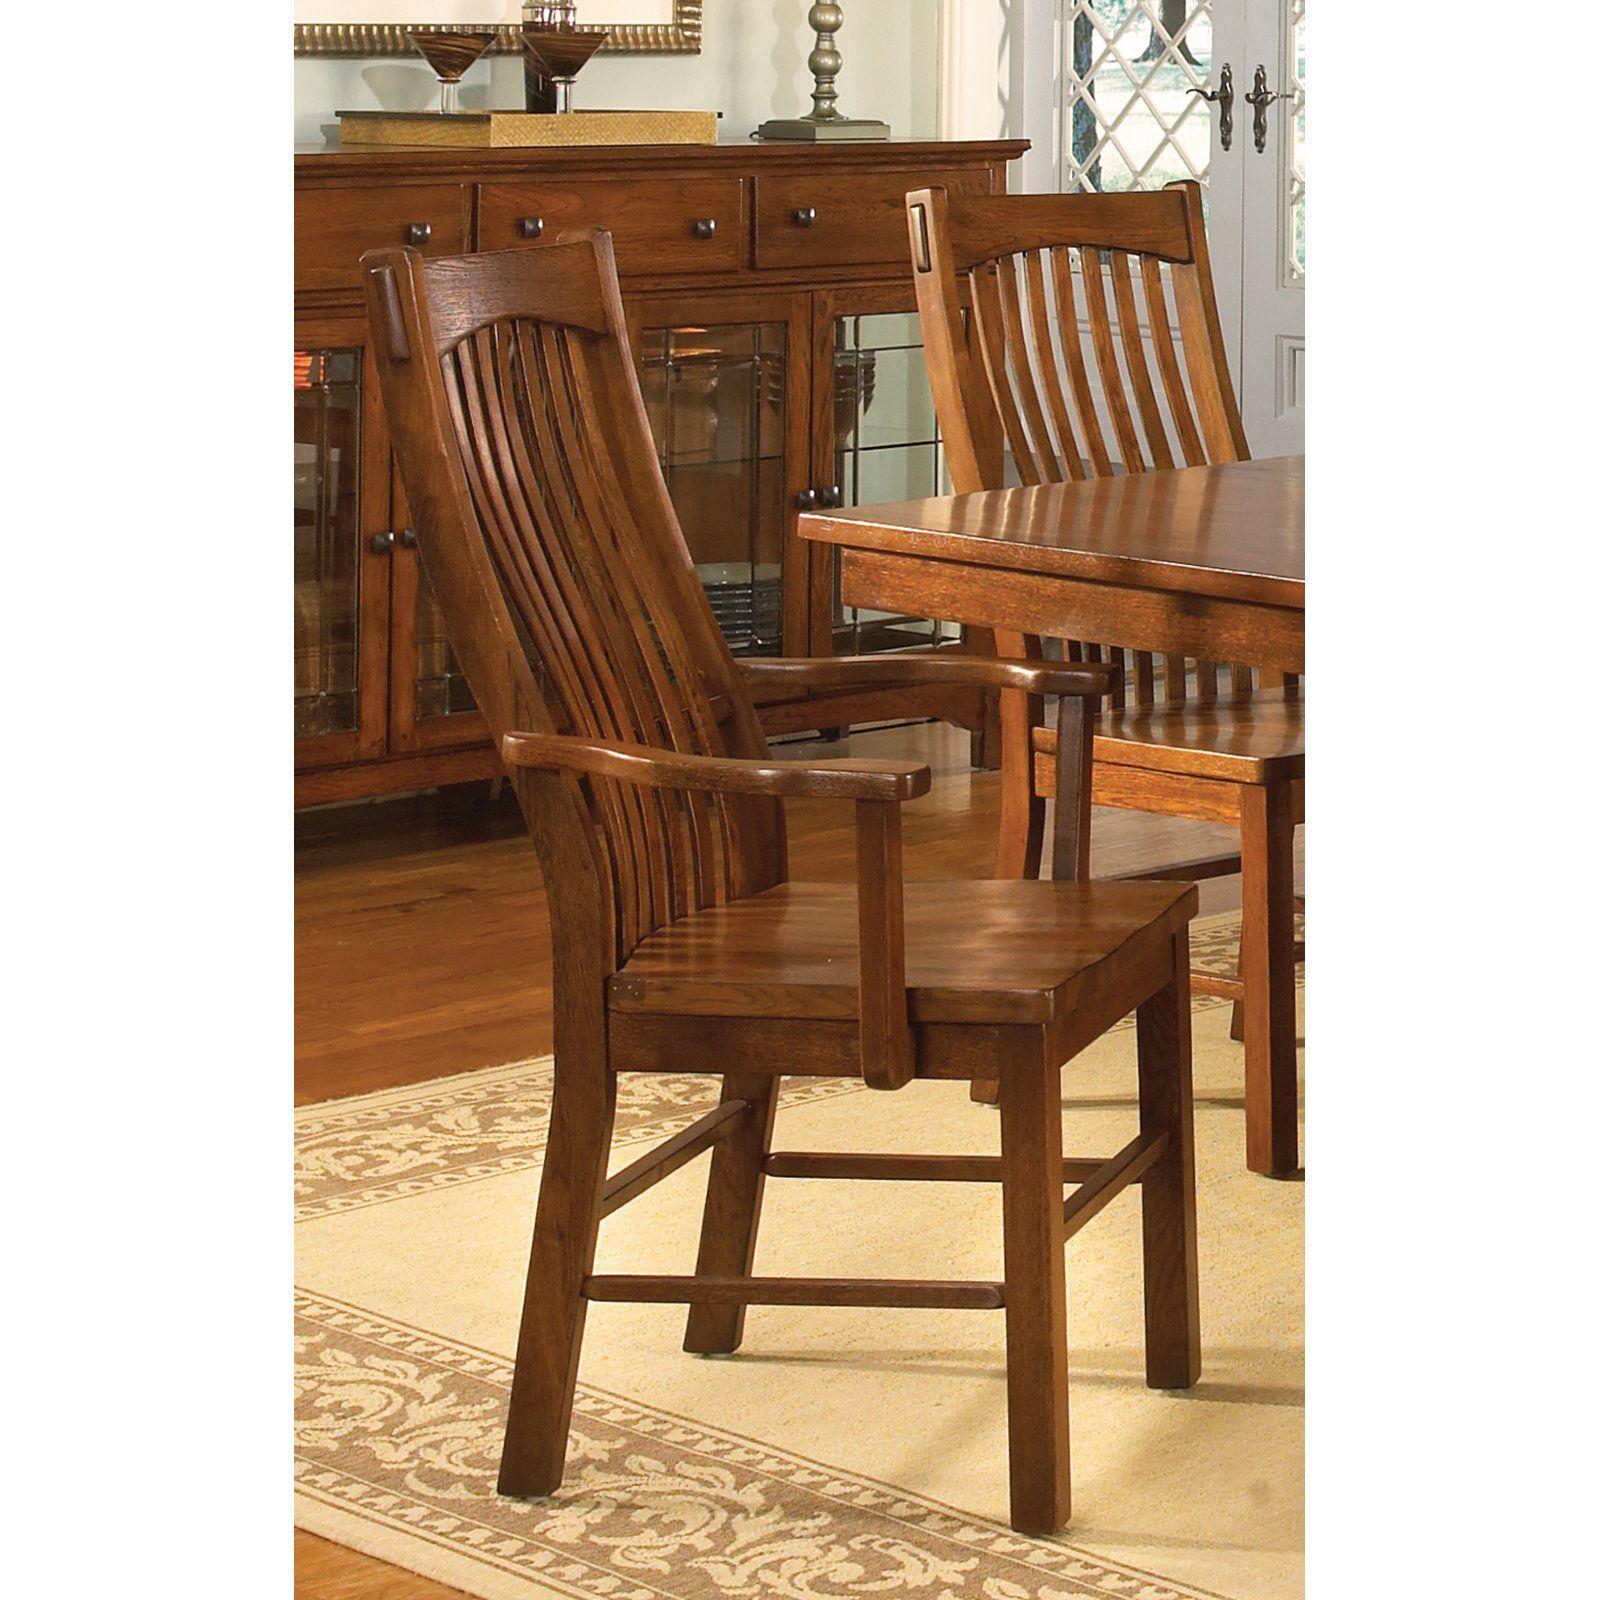 A America Laurelhurst Slat Back Dining Arm Chair Set Of 2